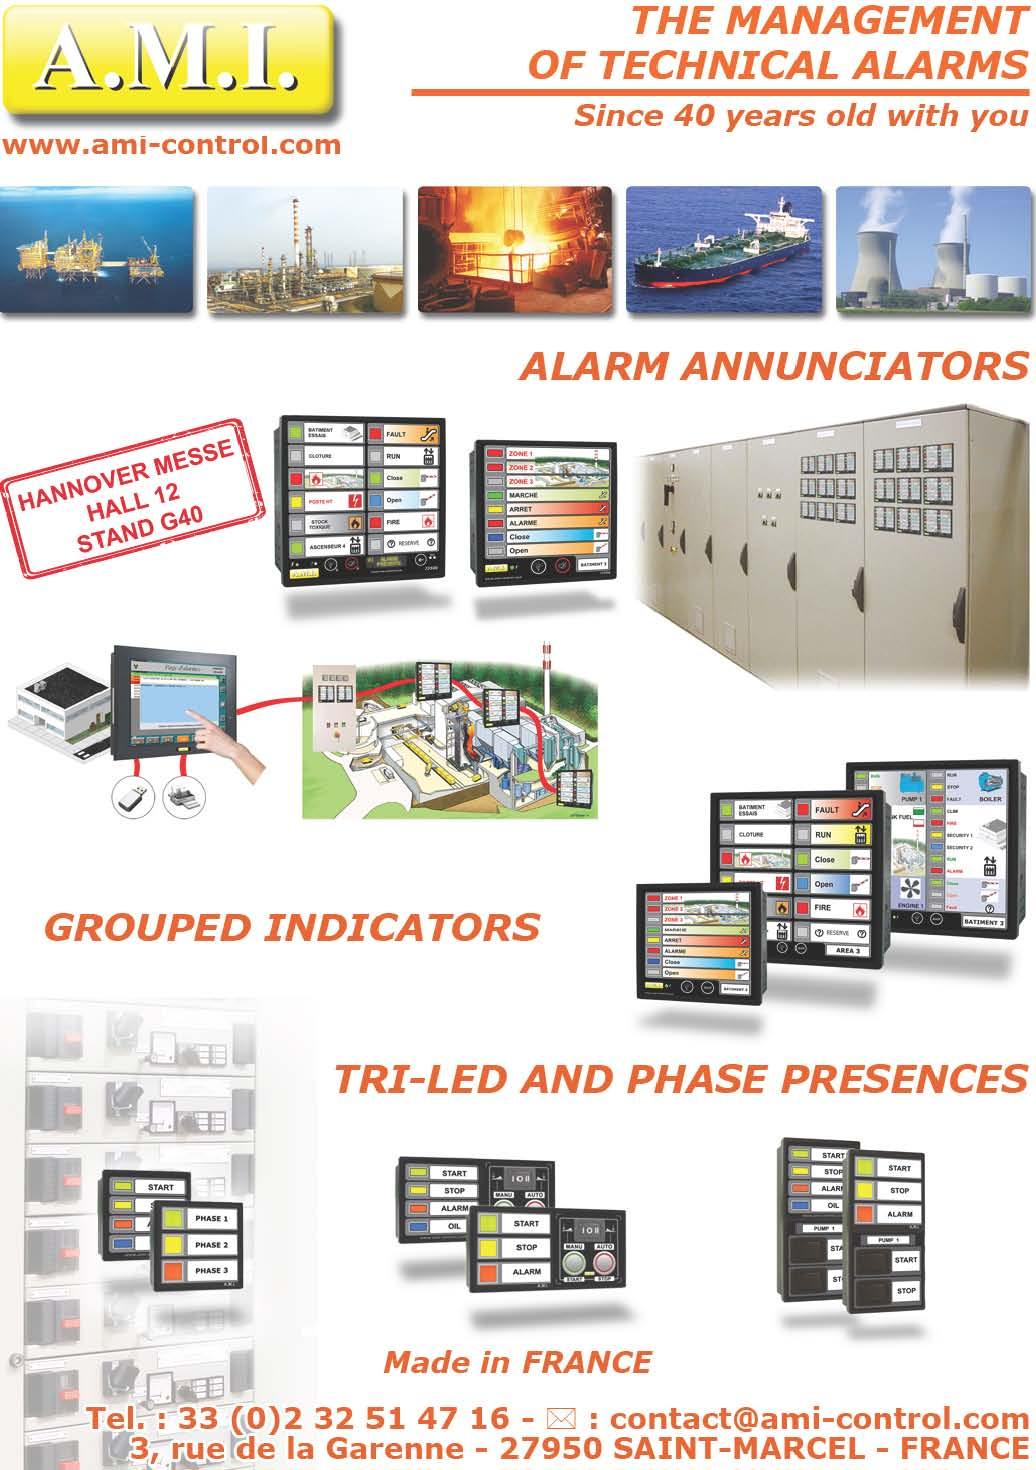 Alarm Annunicators Grouped Indicators Tri Led And Phase Presences Fuse Monitor